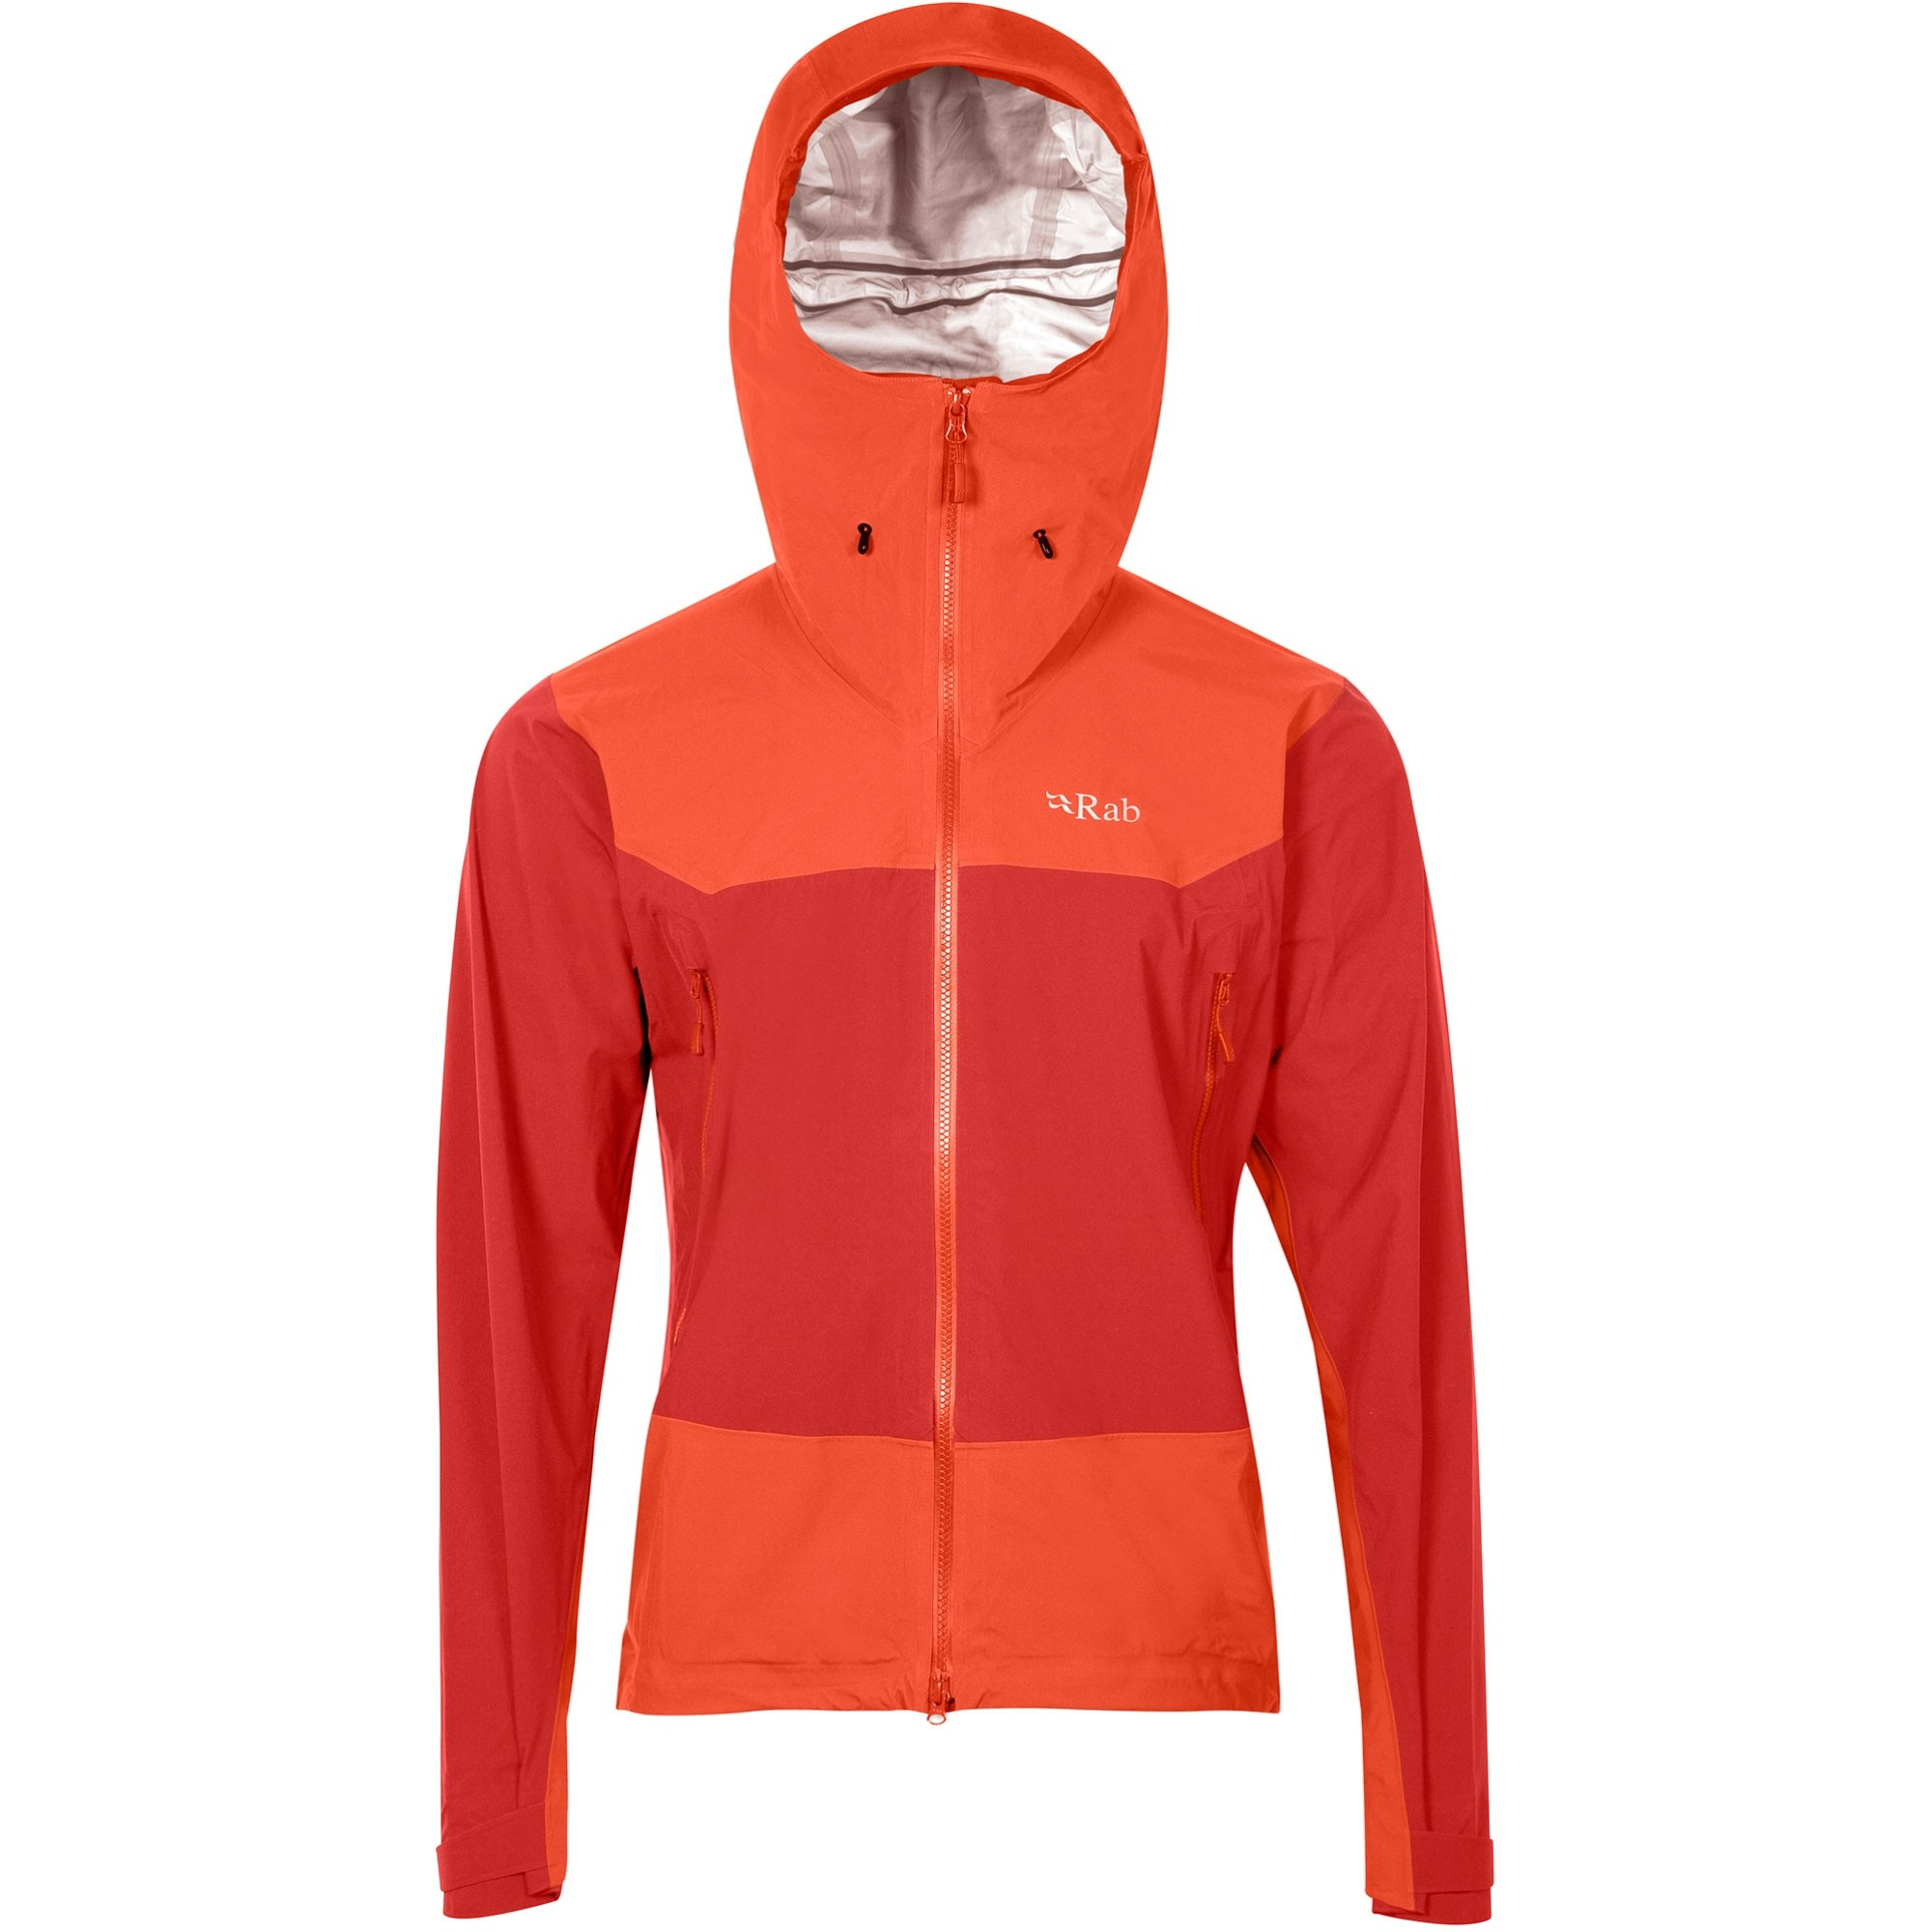 Rab Mantra Waterproof Jacket - Horizon